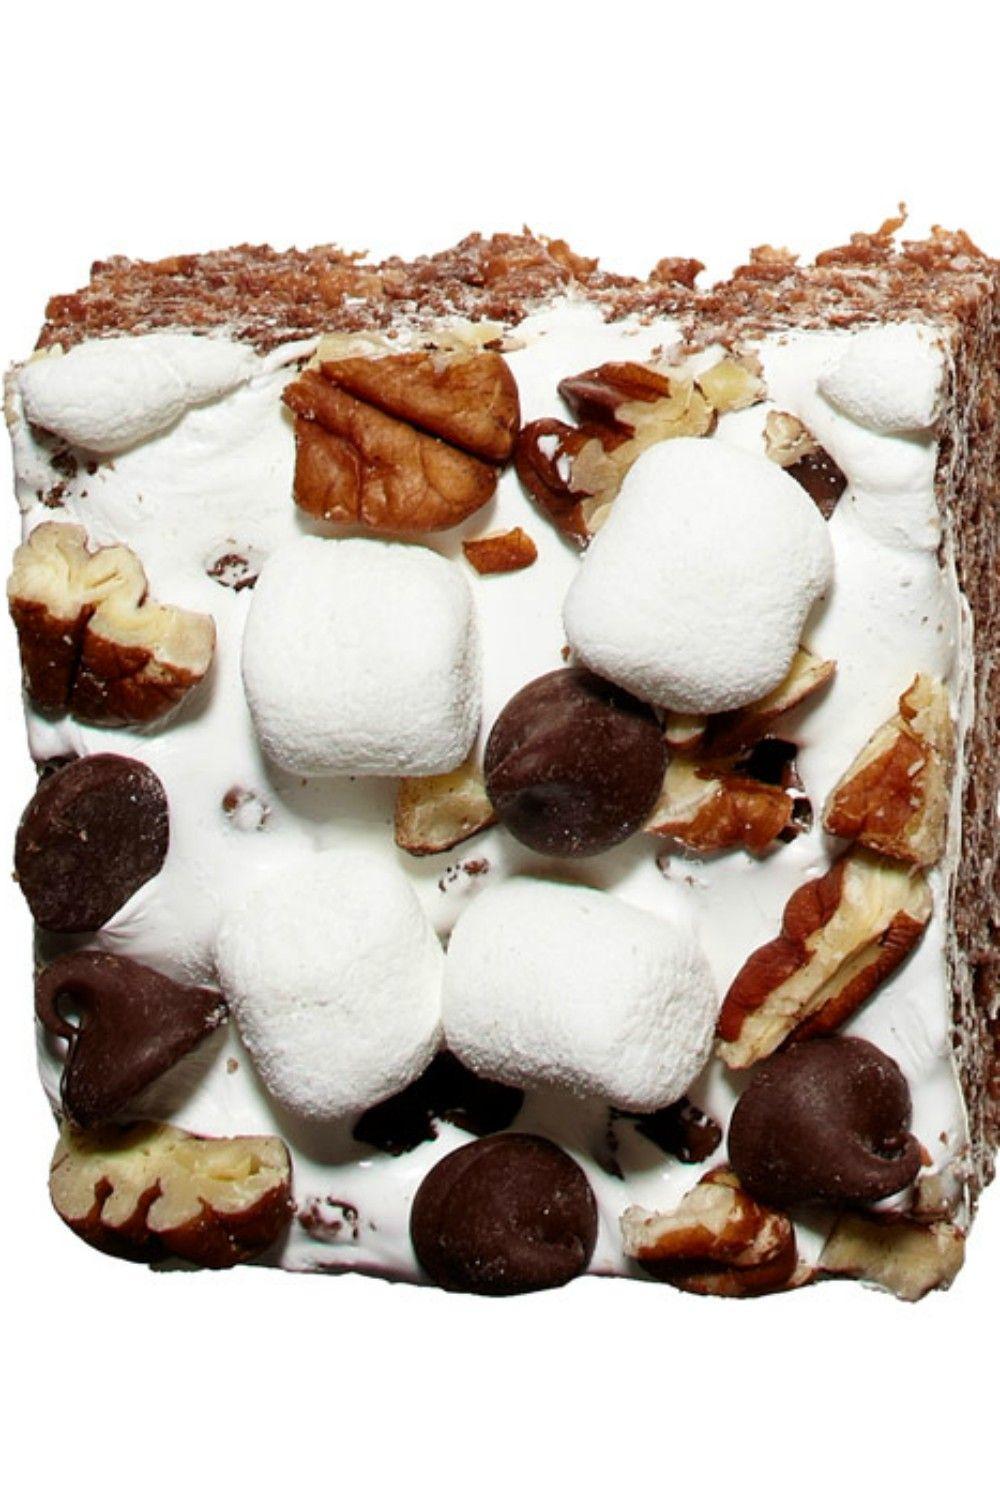 17 Nutella Dessert Recipes - Easy Desserts with Nutella